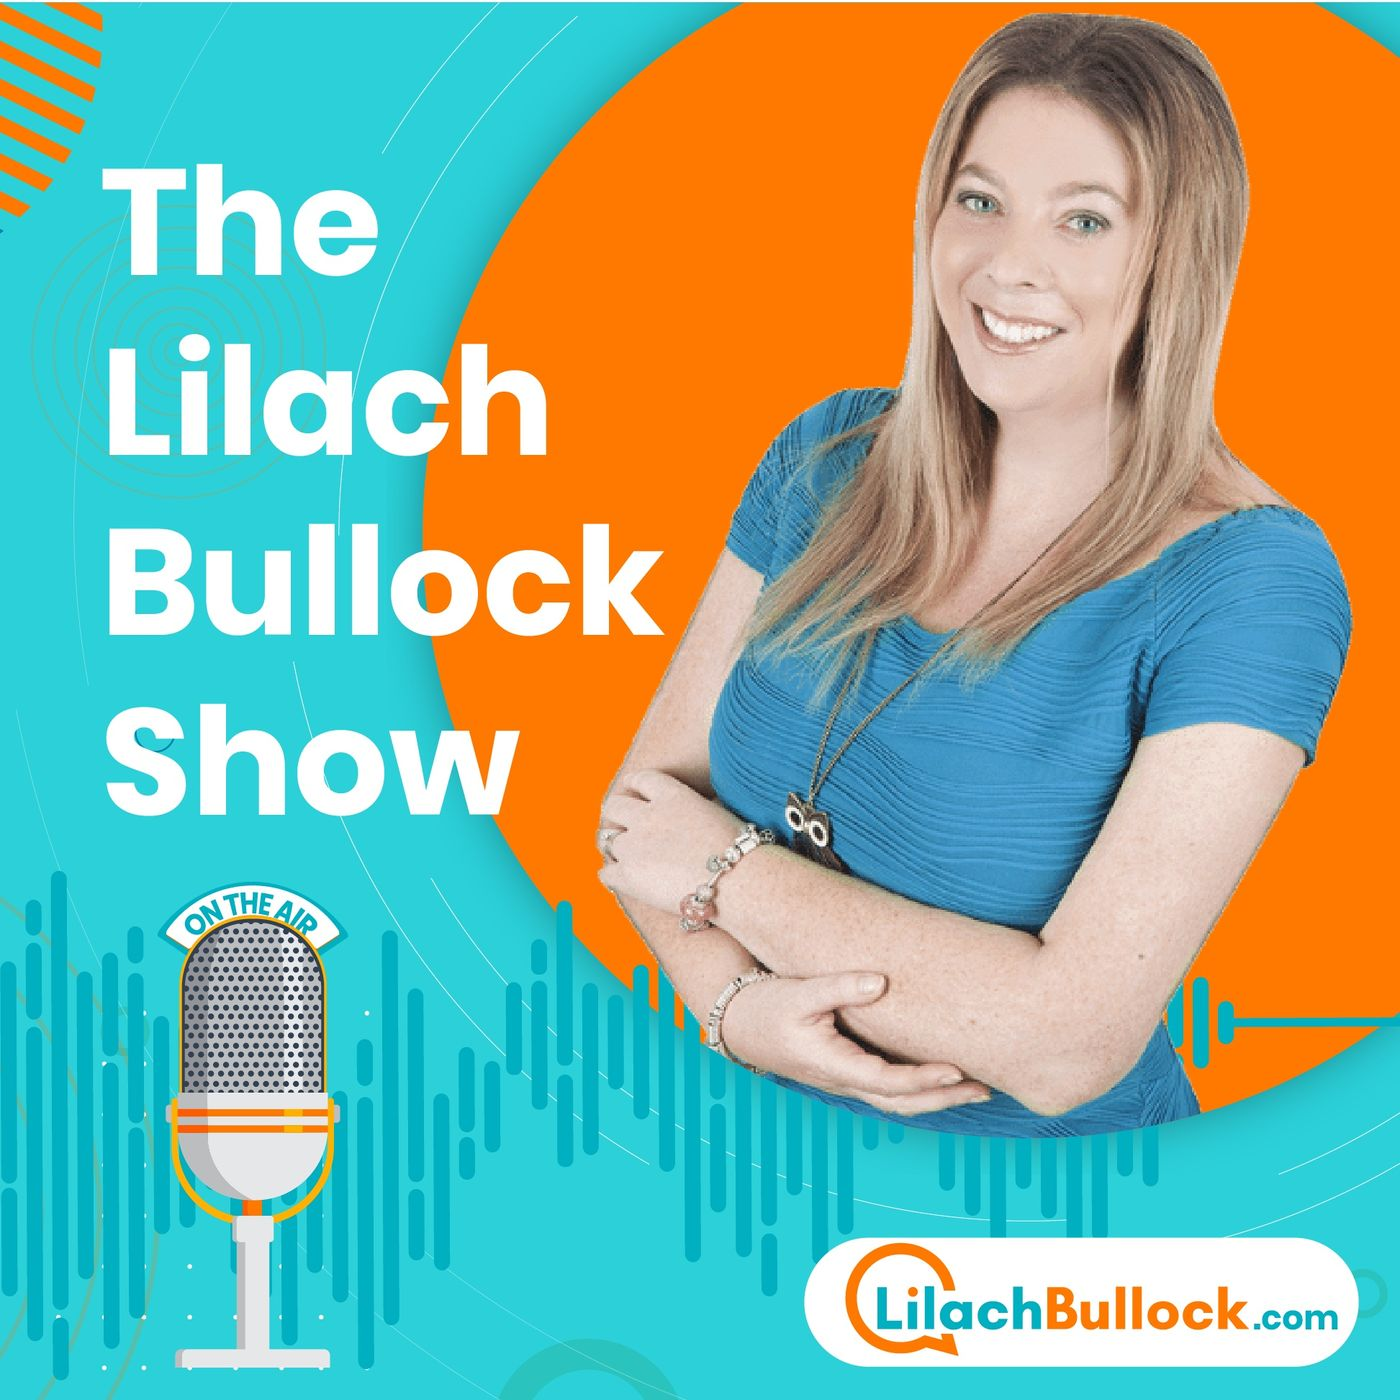 The Lilach Bullock Show